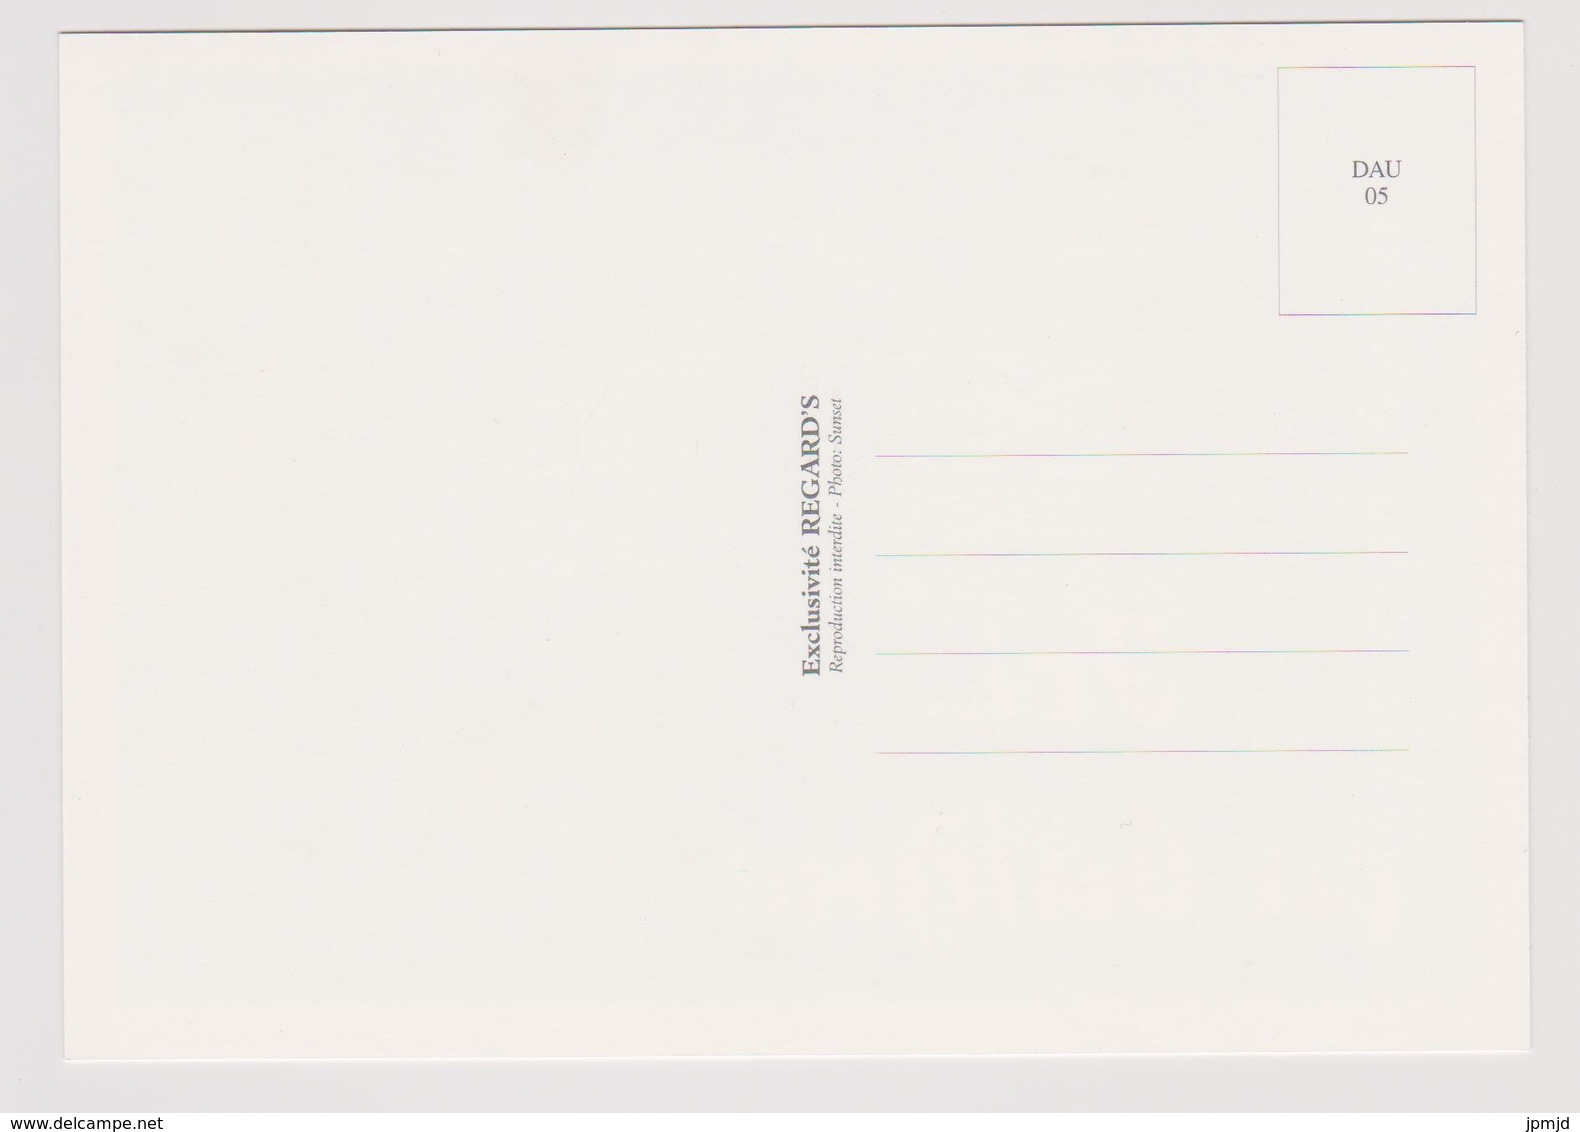 Ici ça Baigne - Dauphins - Exclusivité REGARD'S N° DAU 05 - Dauphins